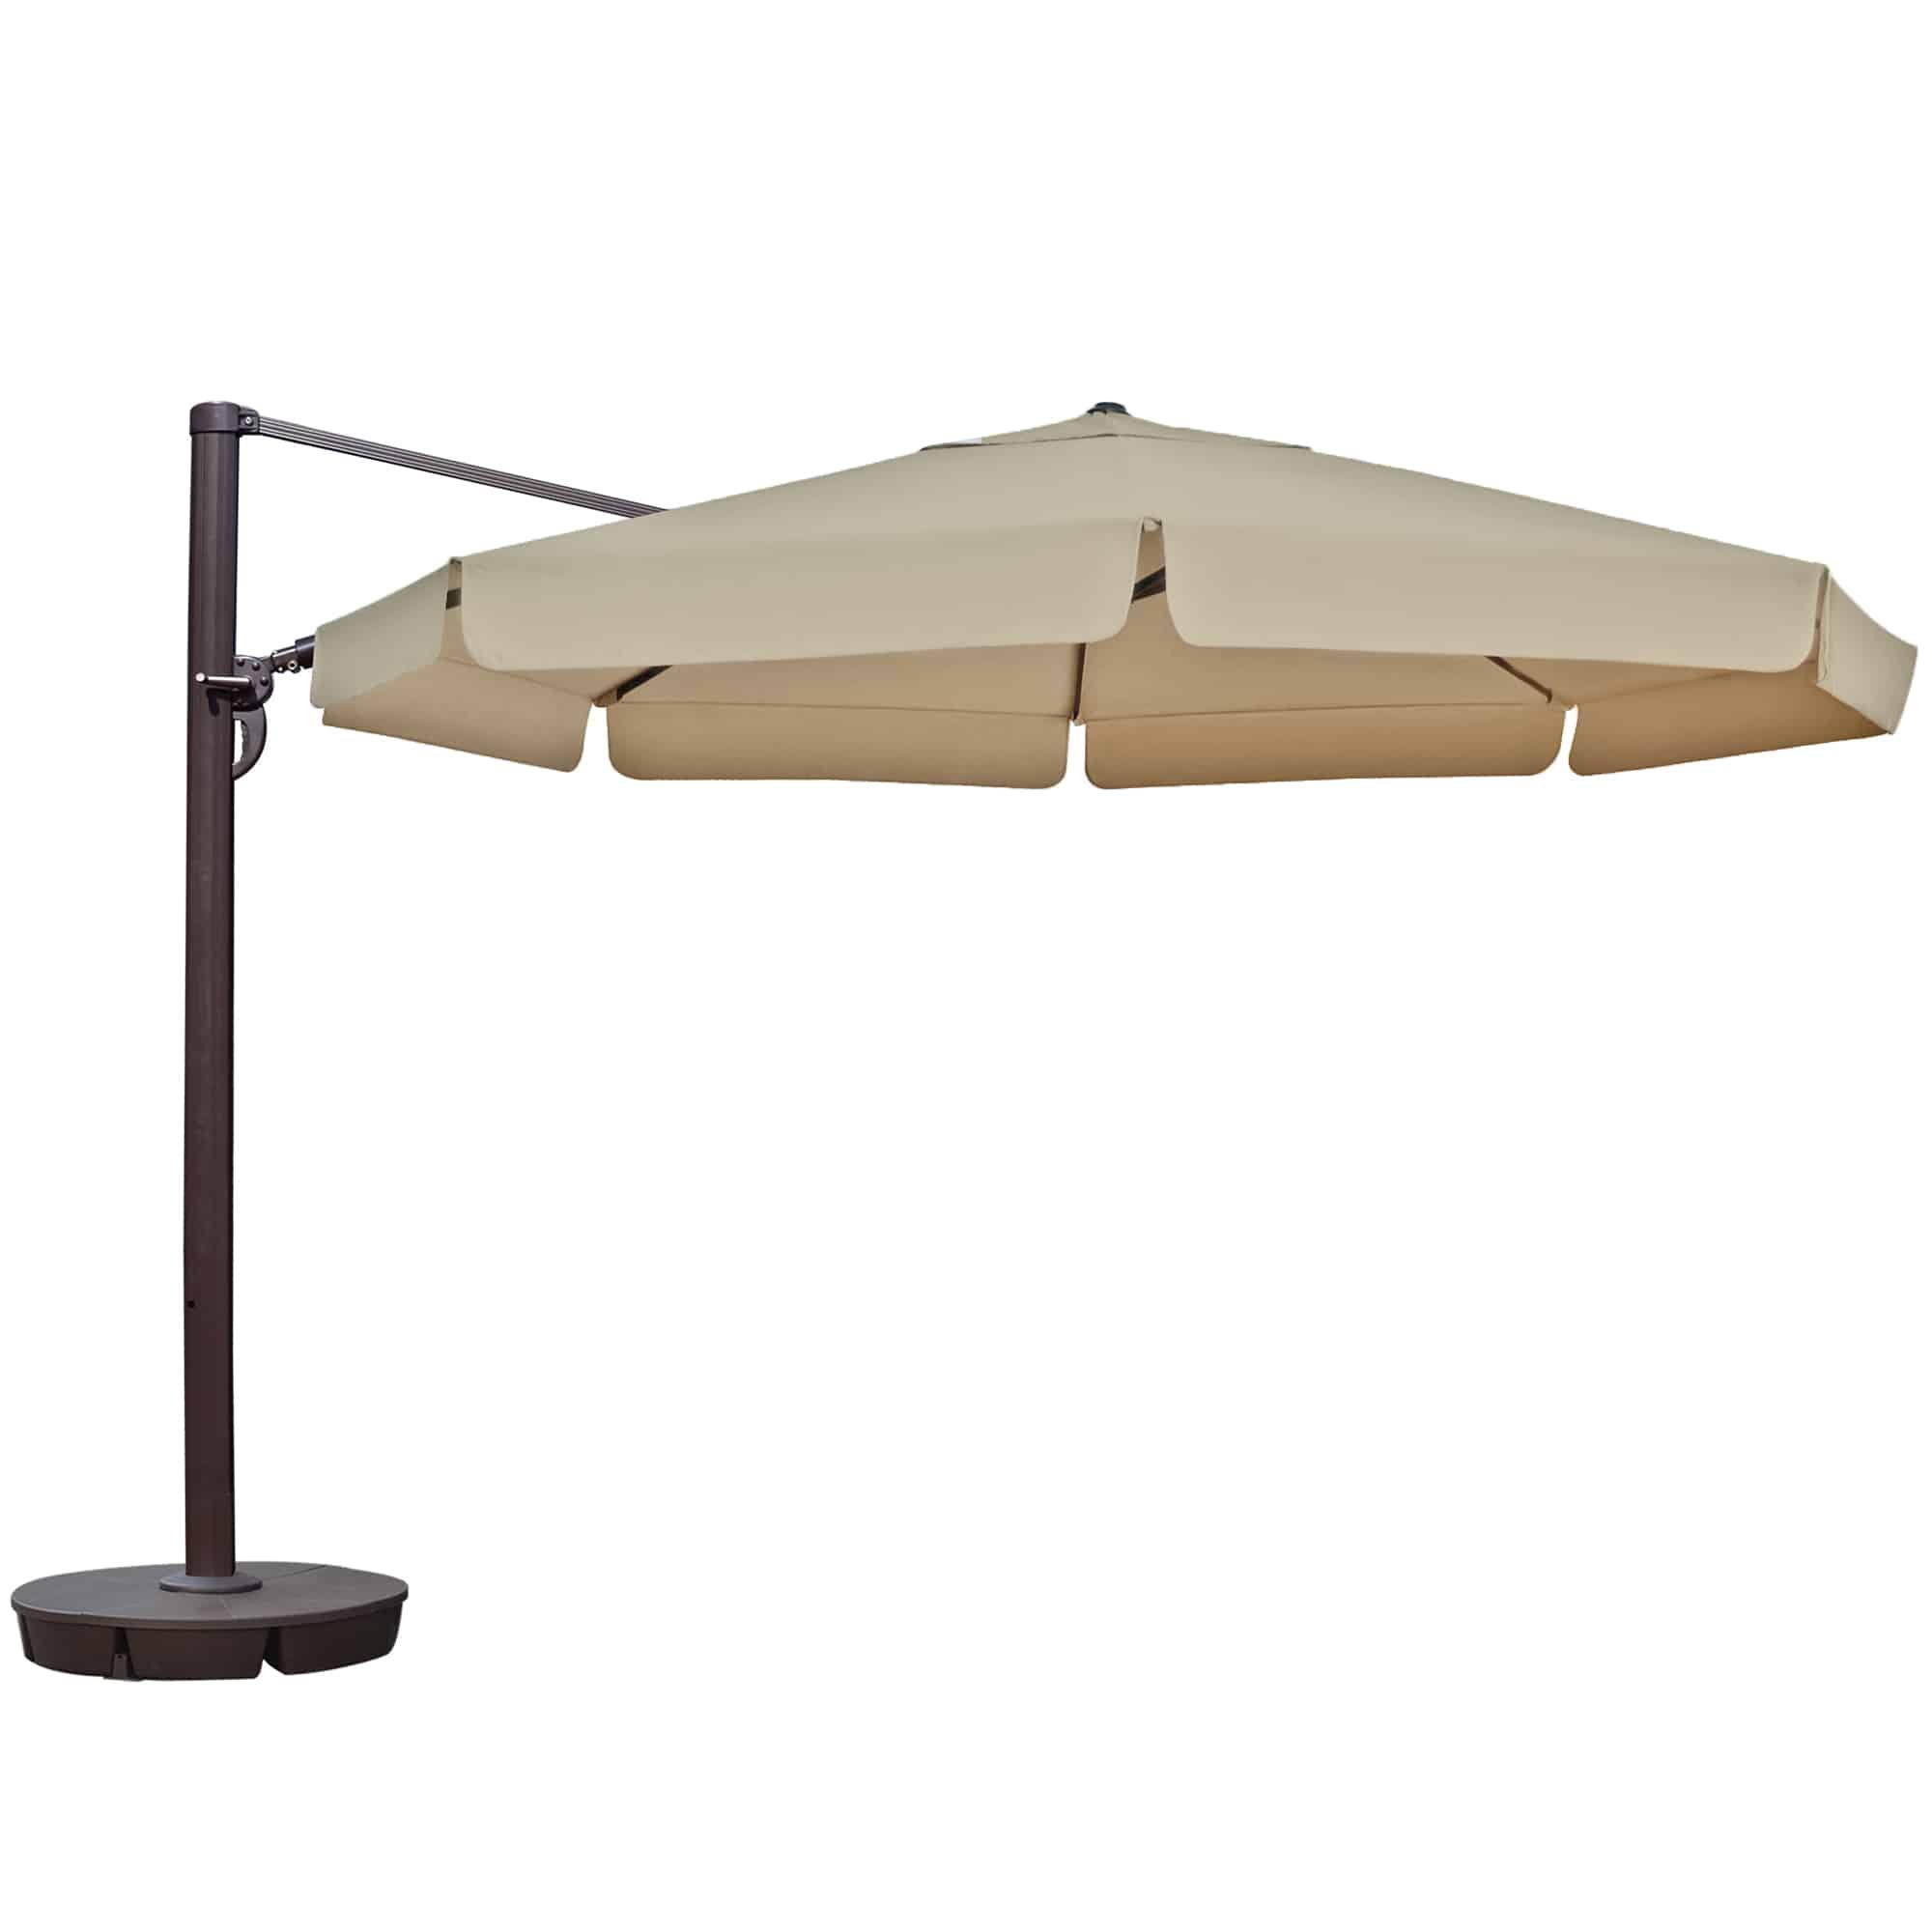 victoria 13 ft octagonal cantilever patio umbrella with valance in sunbrella acrylic